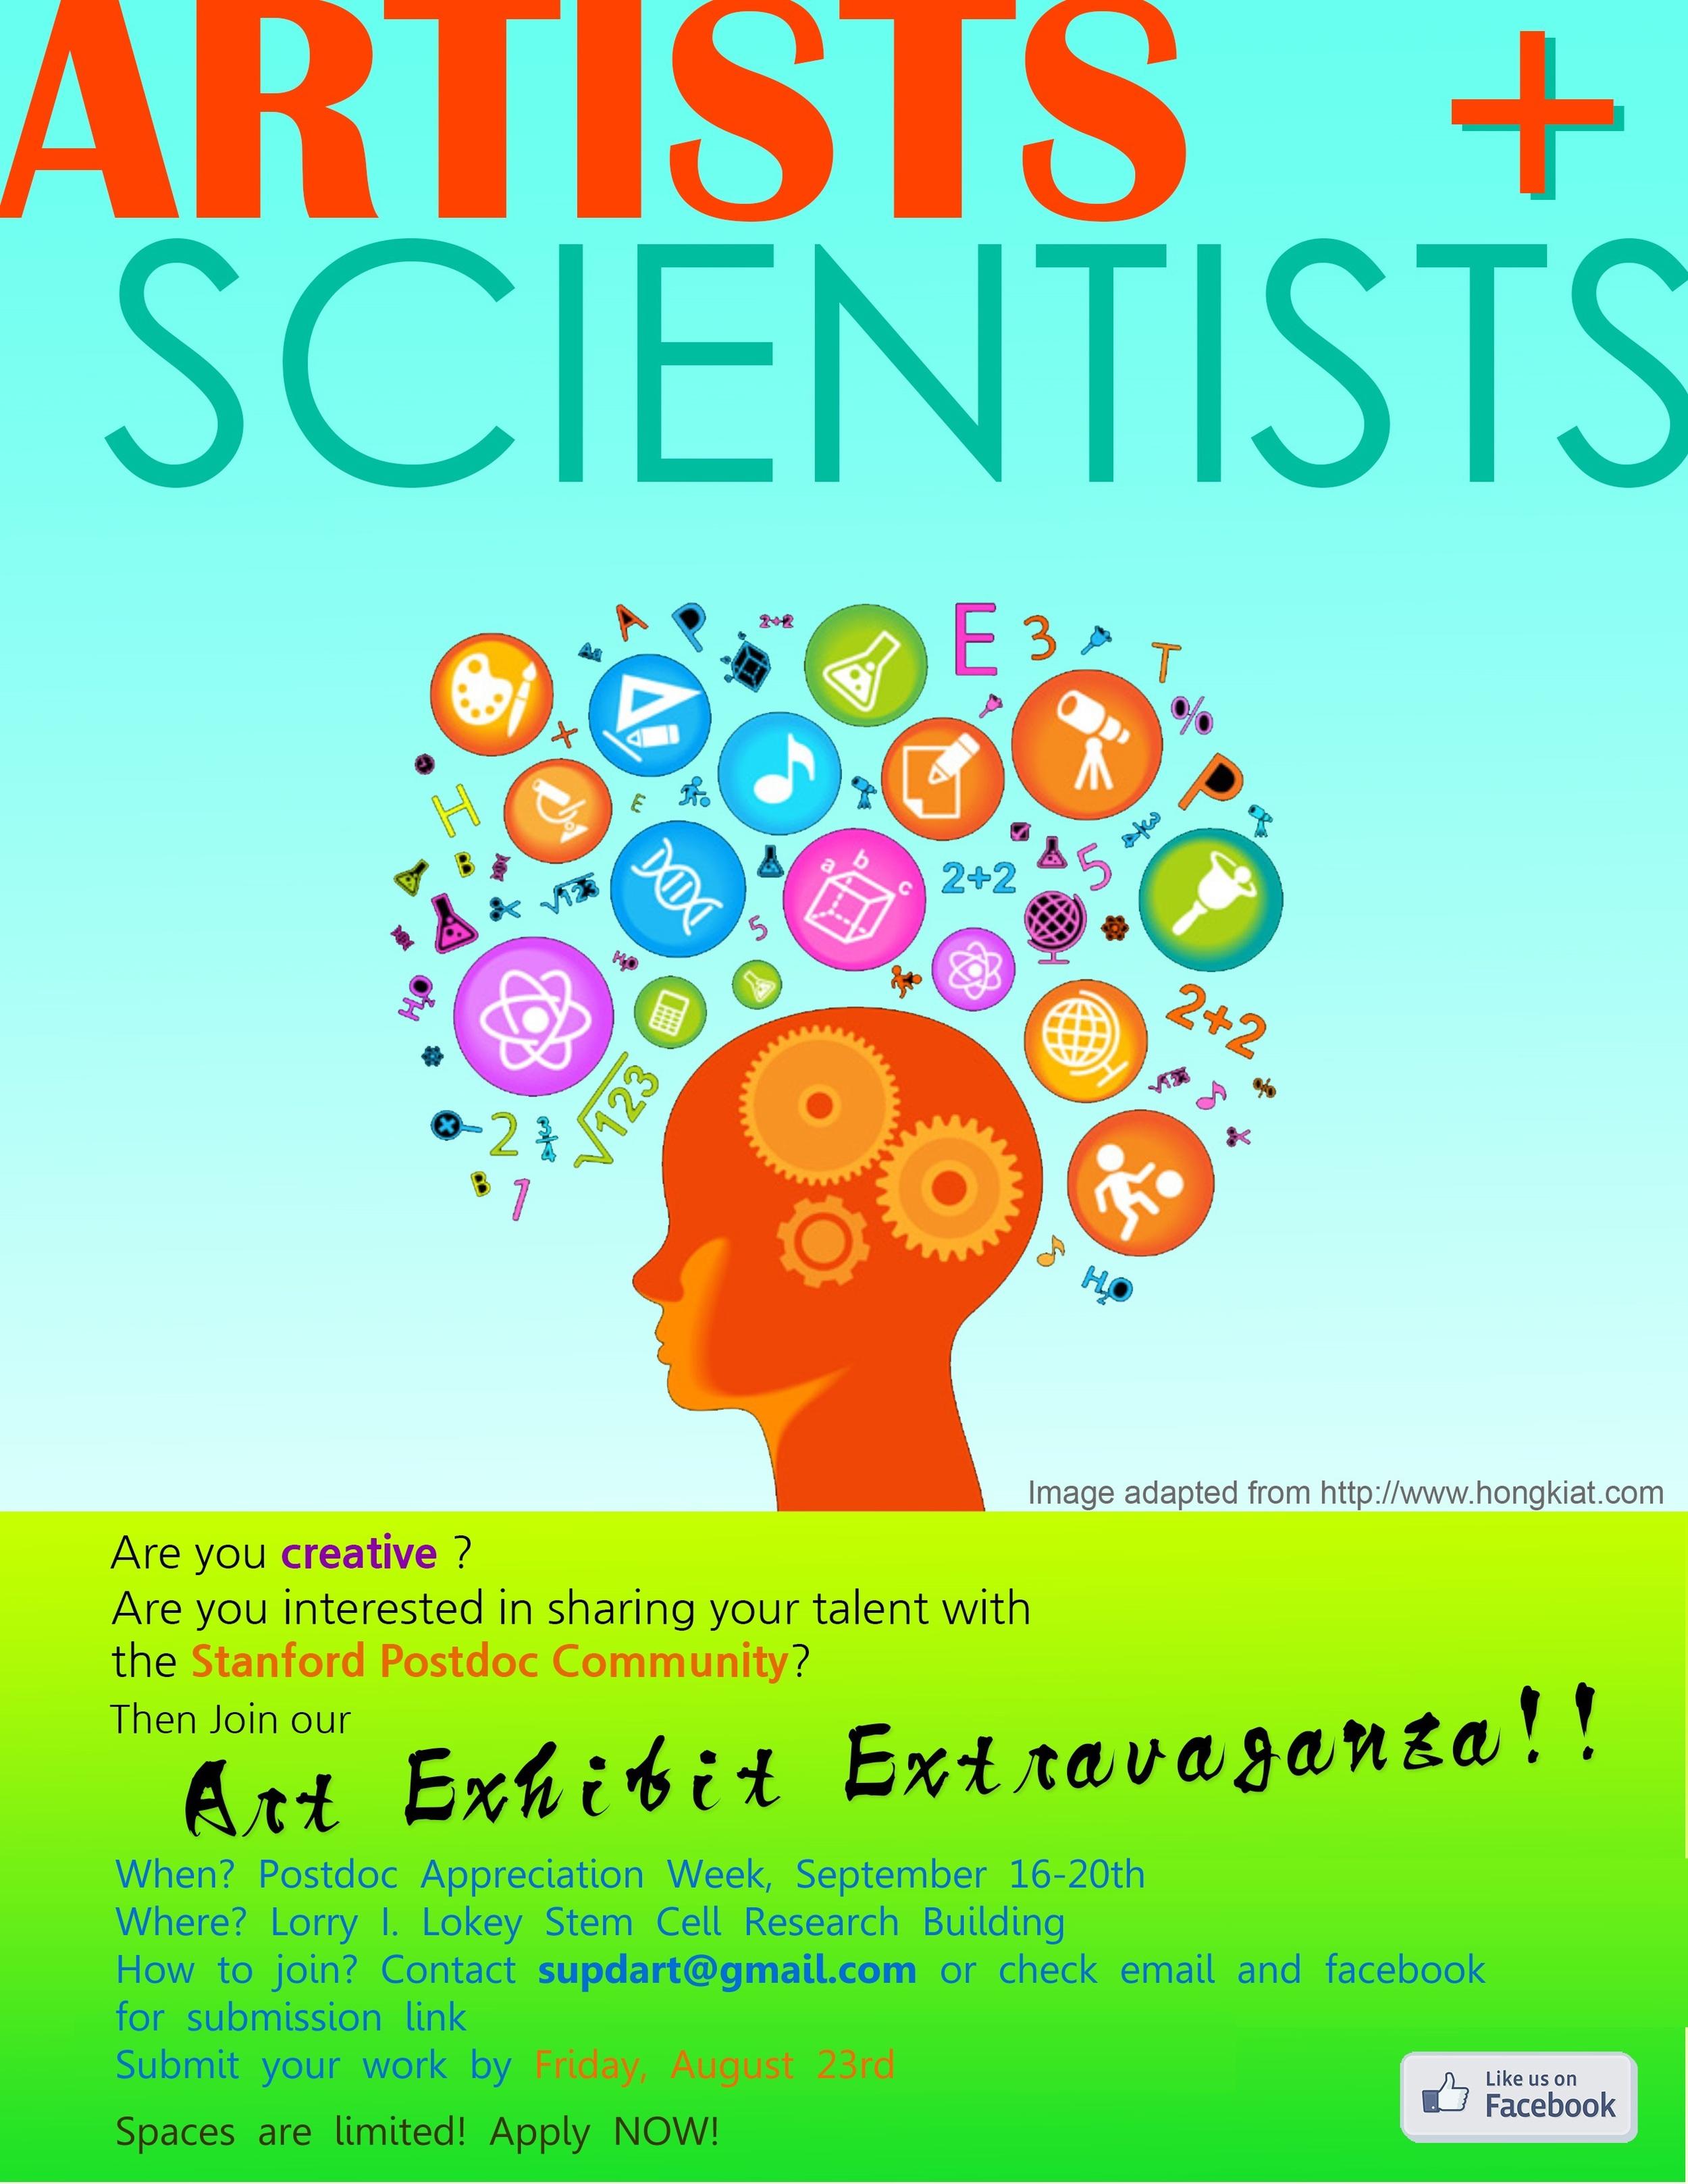 Art Exhibit Extravaganza flyer_08092013